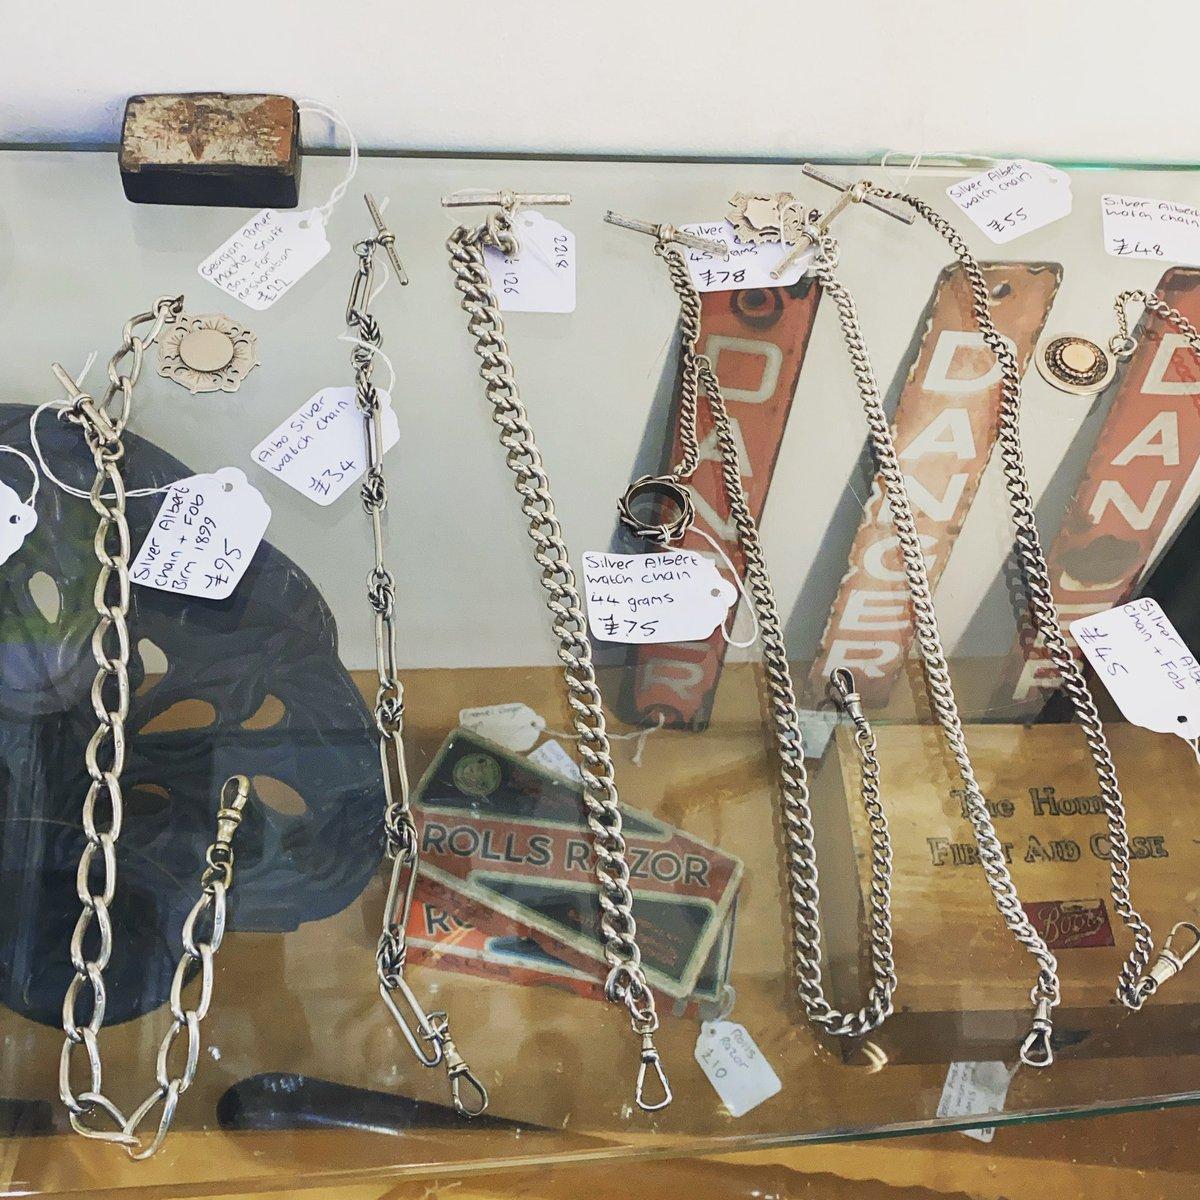 Silver Albert chains #watchfob #silver #albertchains #birmingham #silveralbertchain #astraantiquescentre #hemswell #lincolnshire https://t.co/VMQM1tSaEG